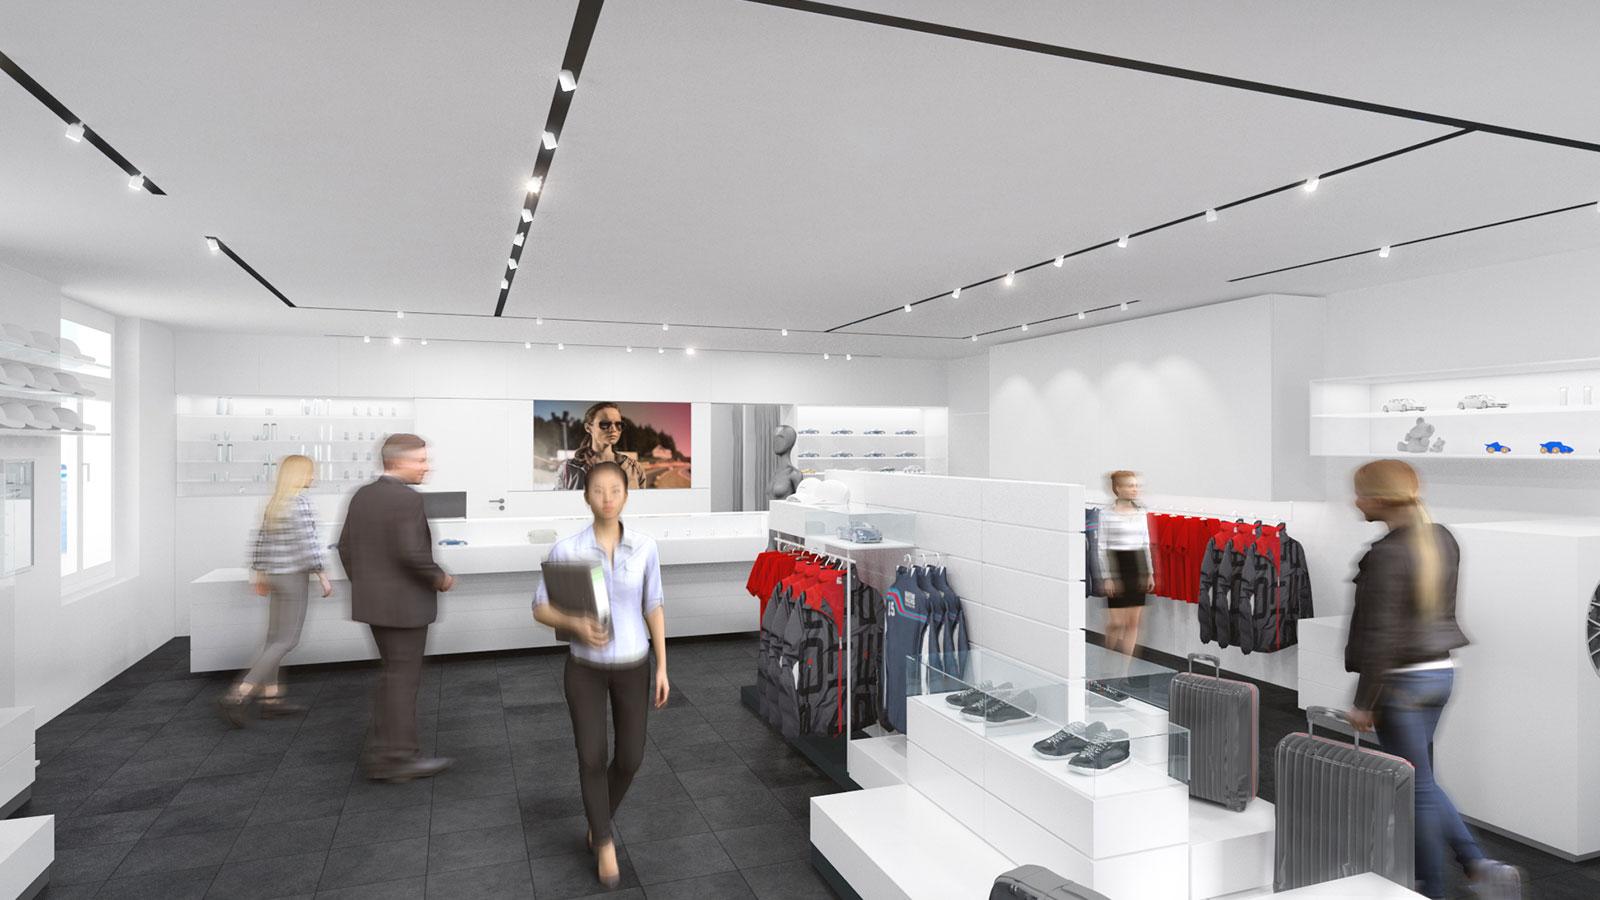 Porsche Accessoires Shop. Mode, Accessoires, Fahrzeugzubehör und mehr.